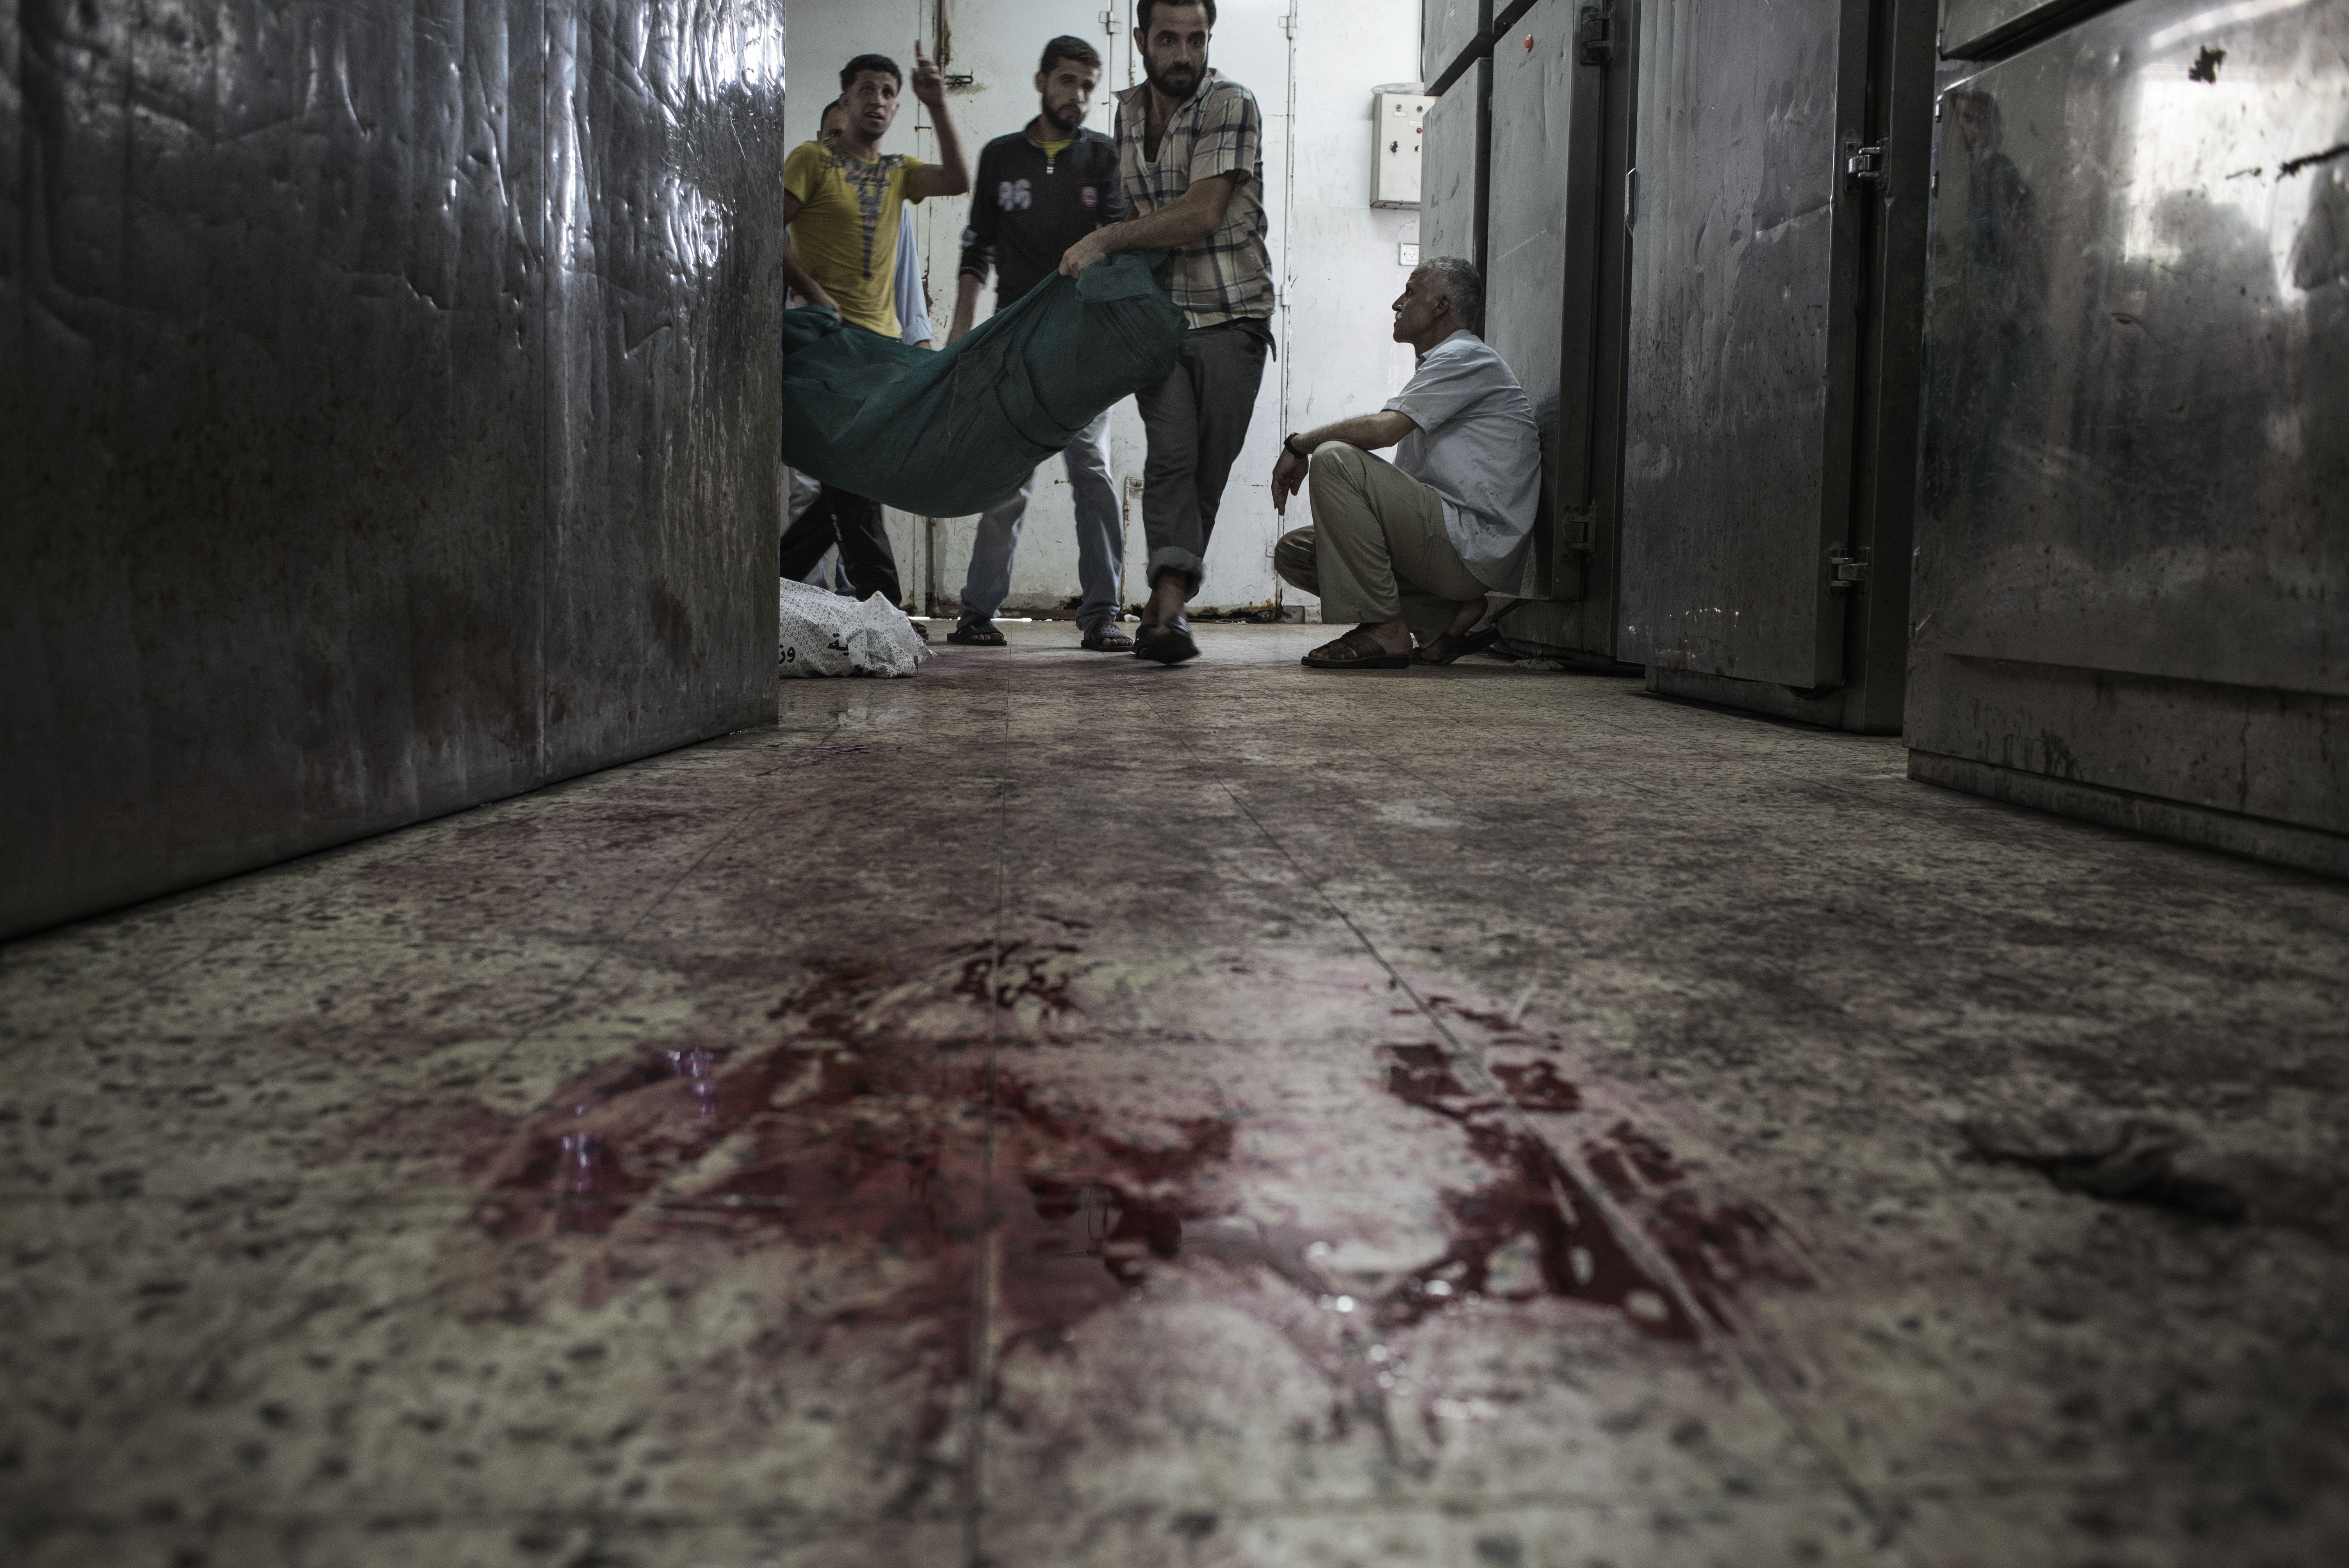 Palestinians carry a body into the Shifa Hospital morgue, Gaza City, July 20, 2014.